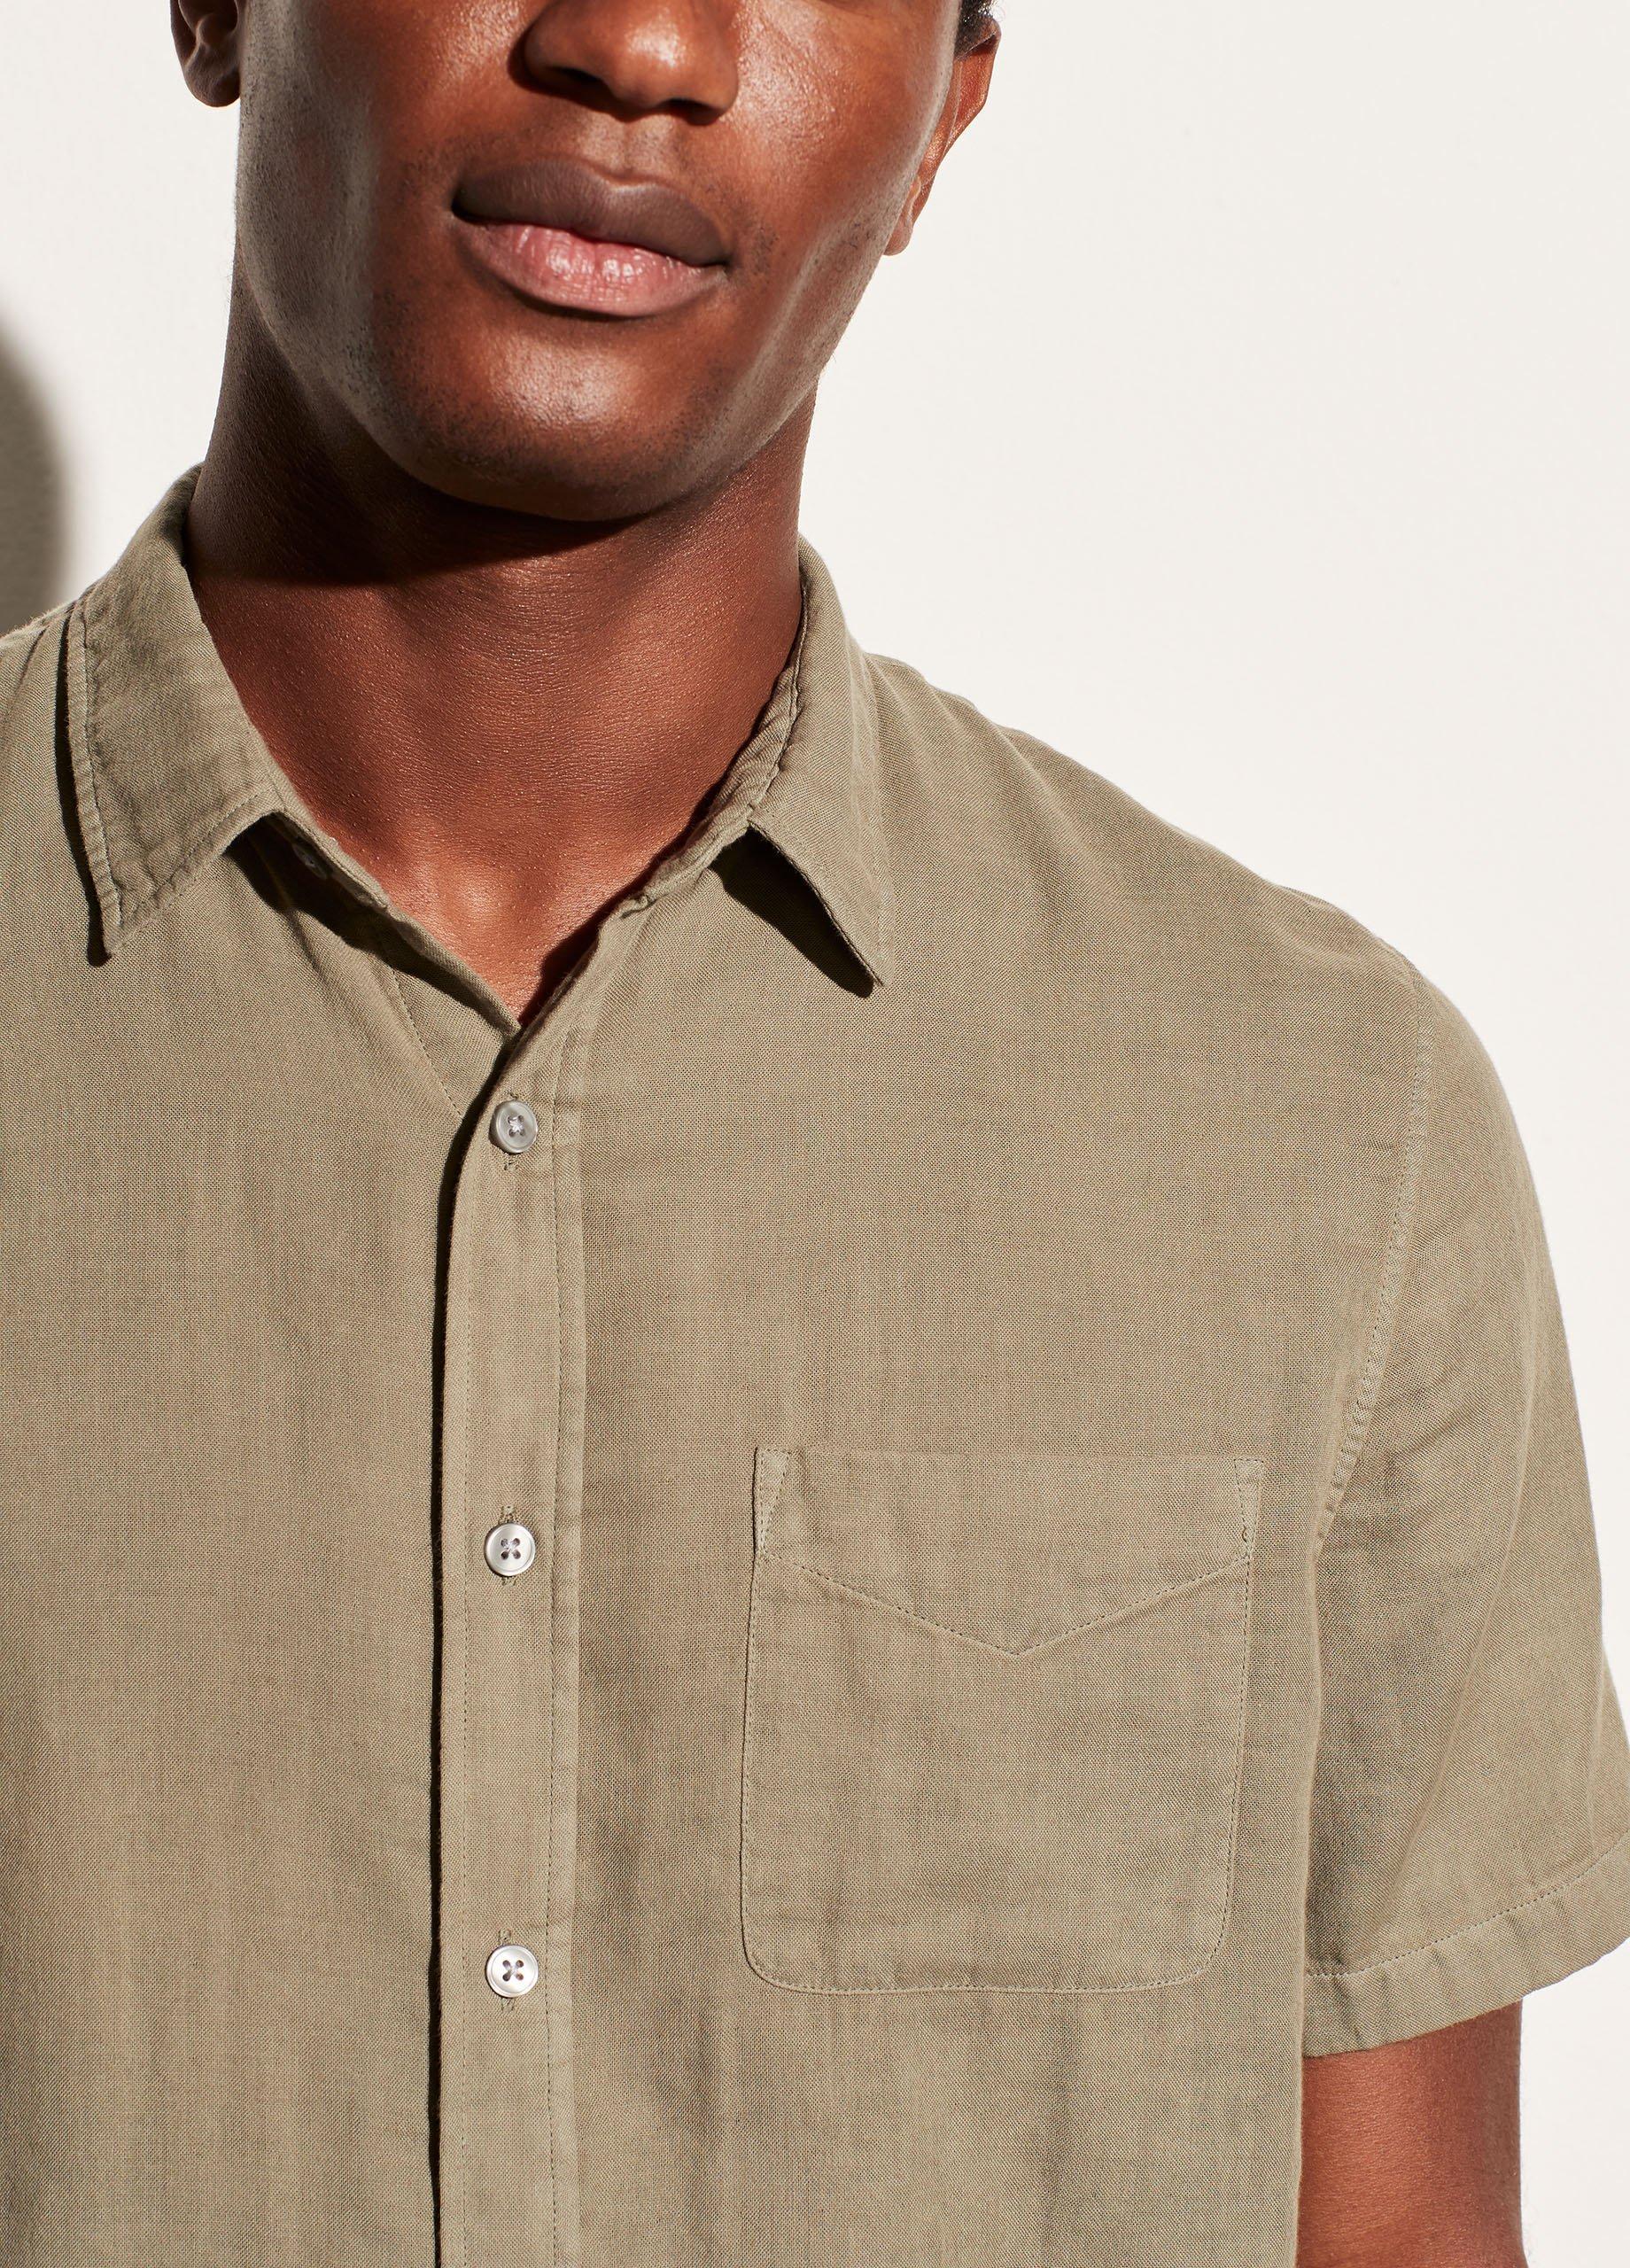 Garment Dye Double Face Short Sleeve